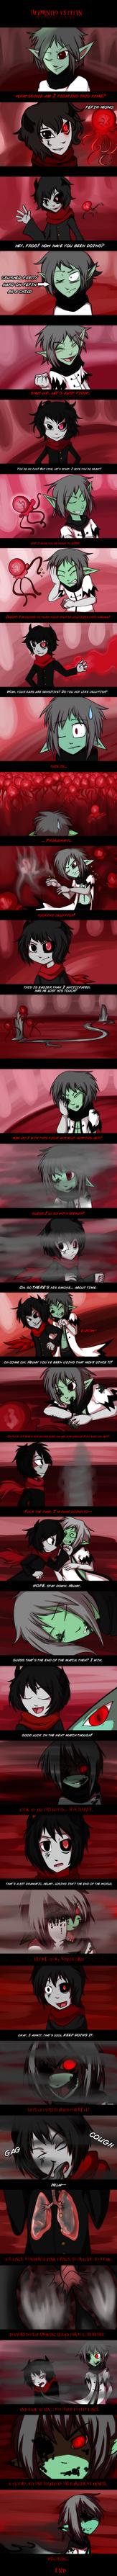 Helmy vs. Fefin by viralremix